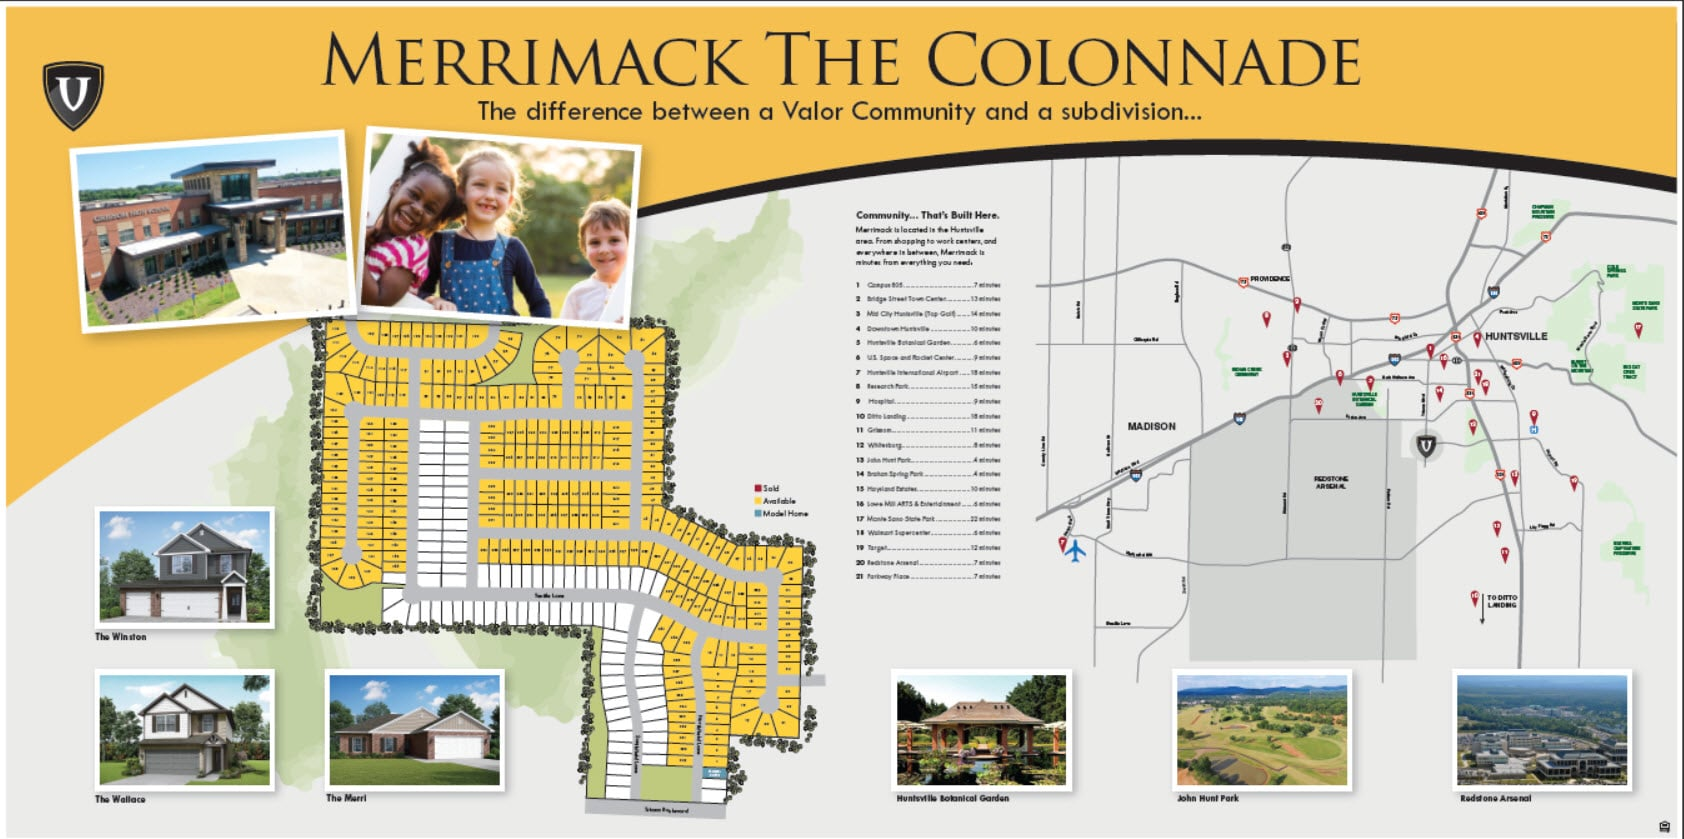 VC Merrimack COLONNADE Combo